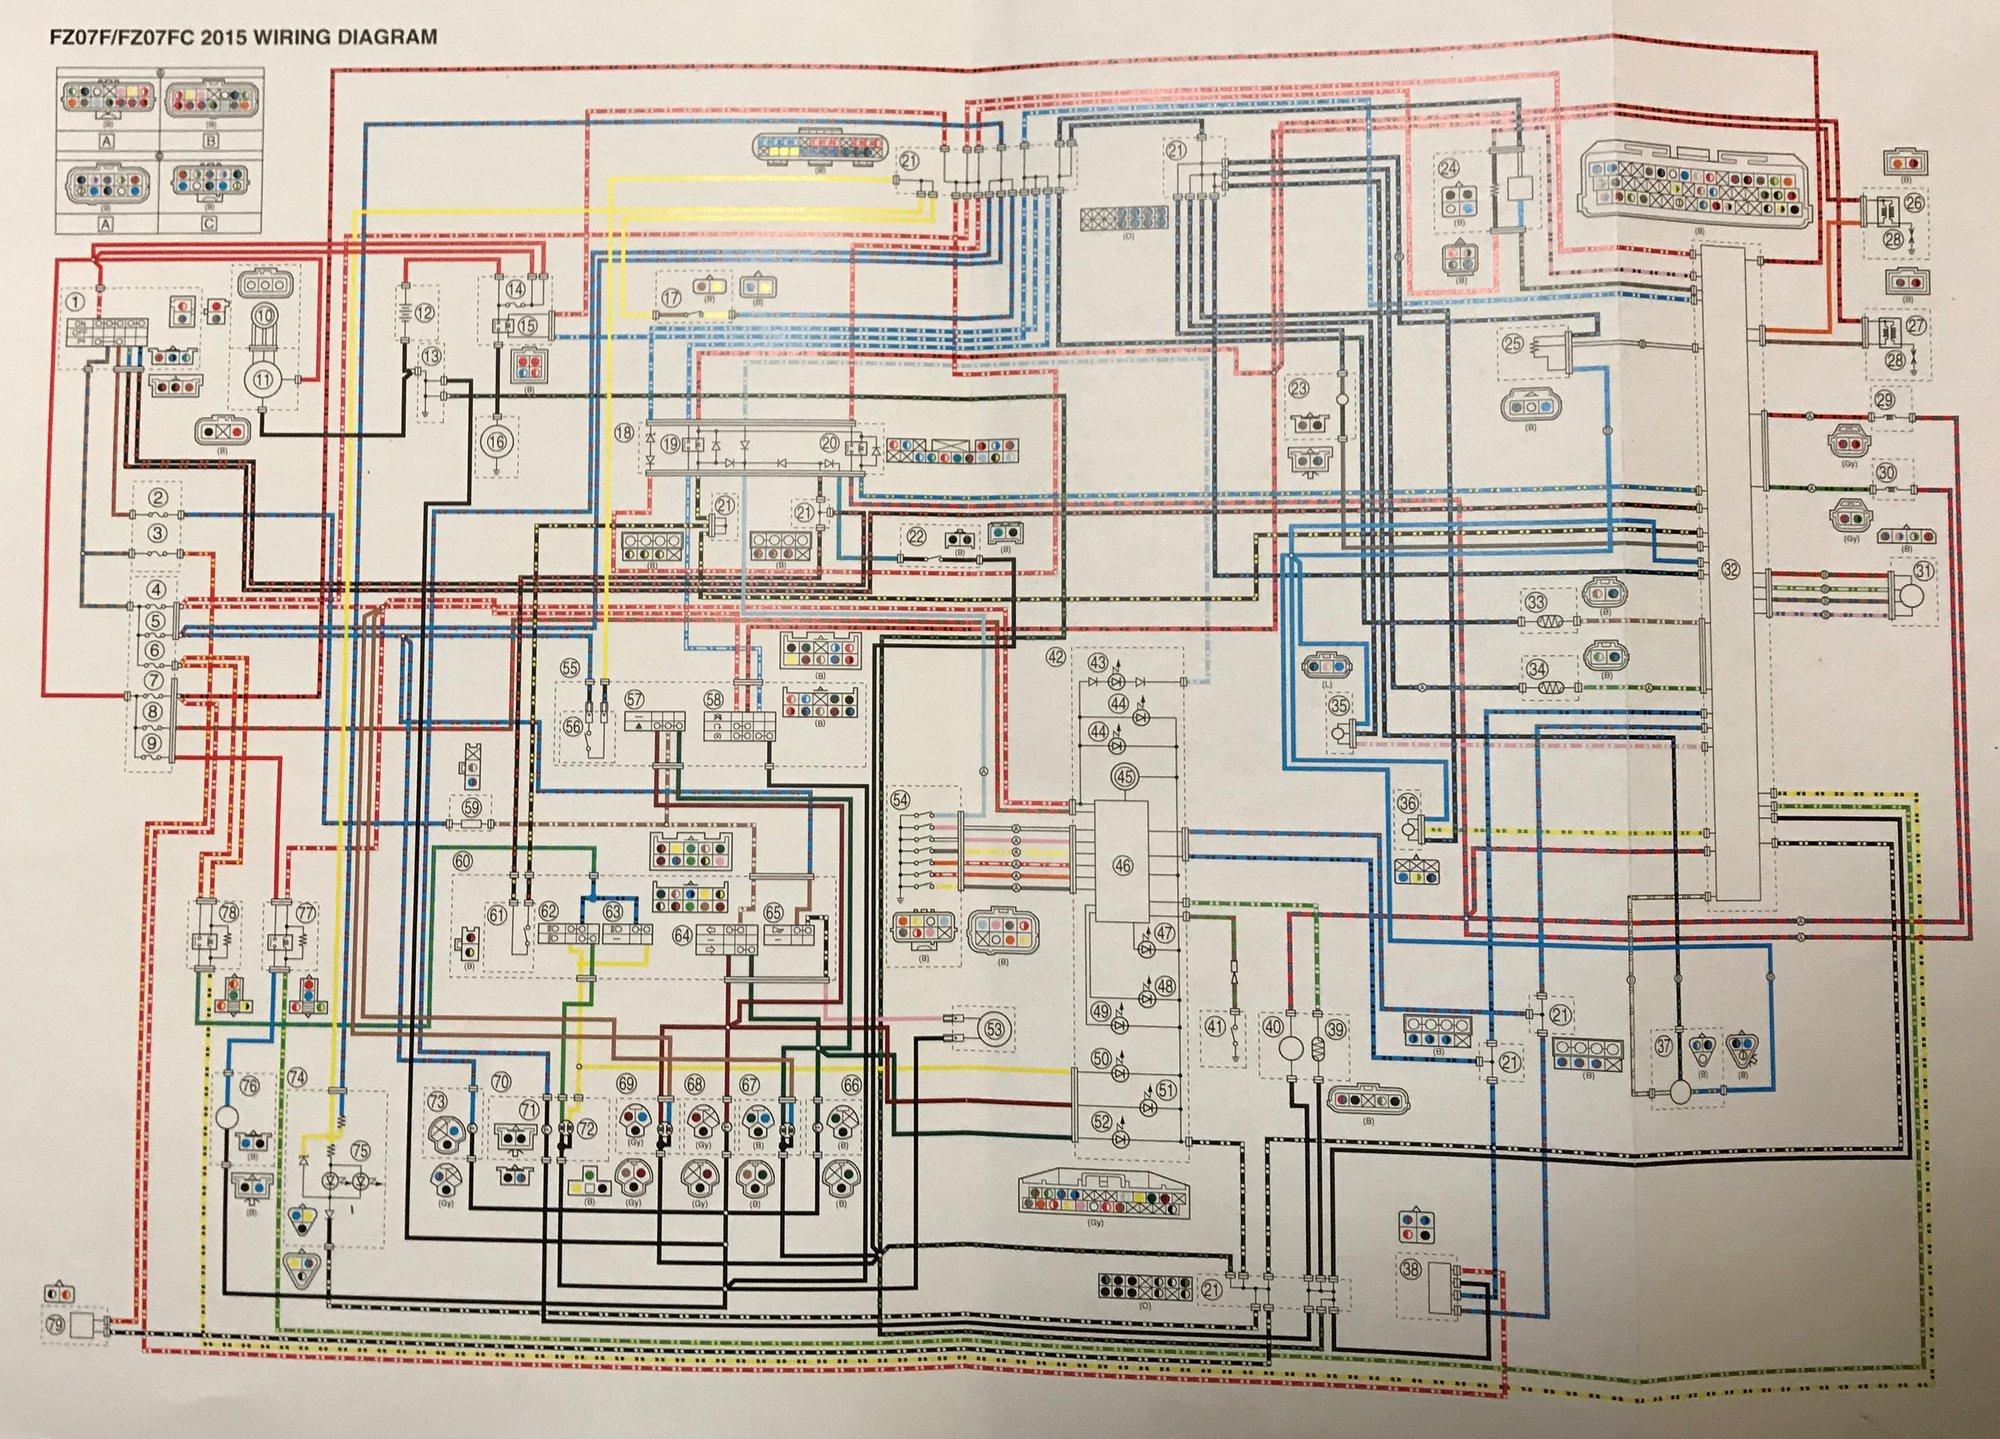 FZ 07 2015 wiring diagram.jpg